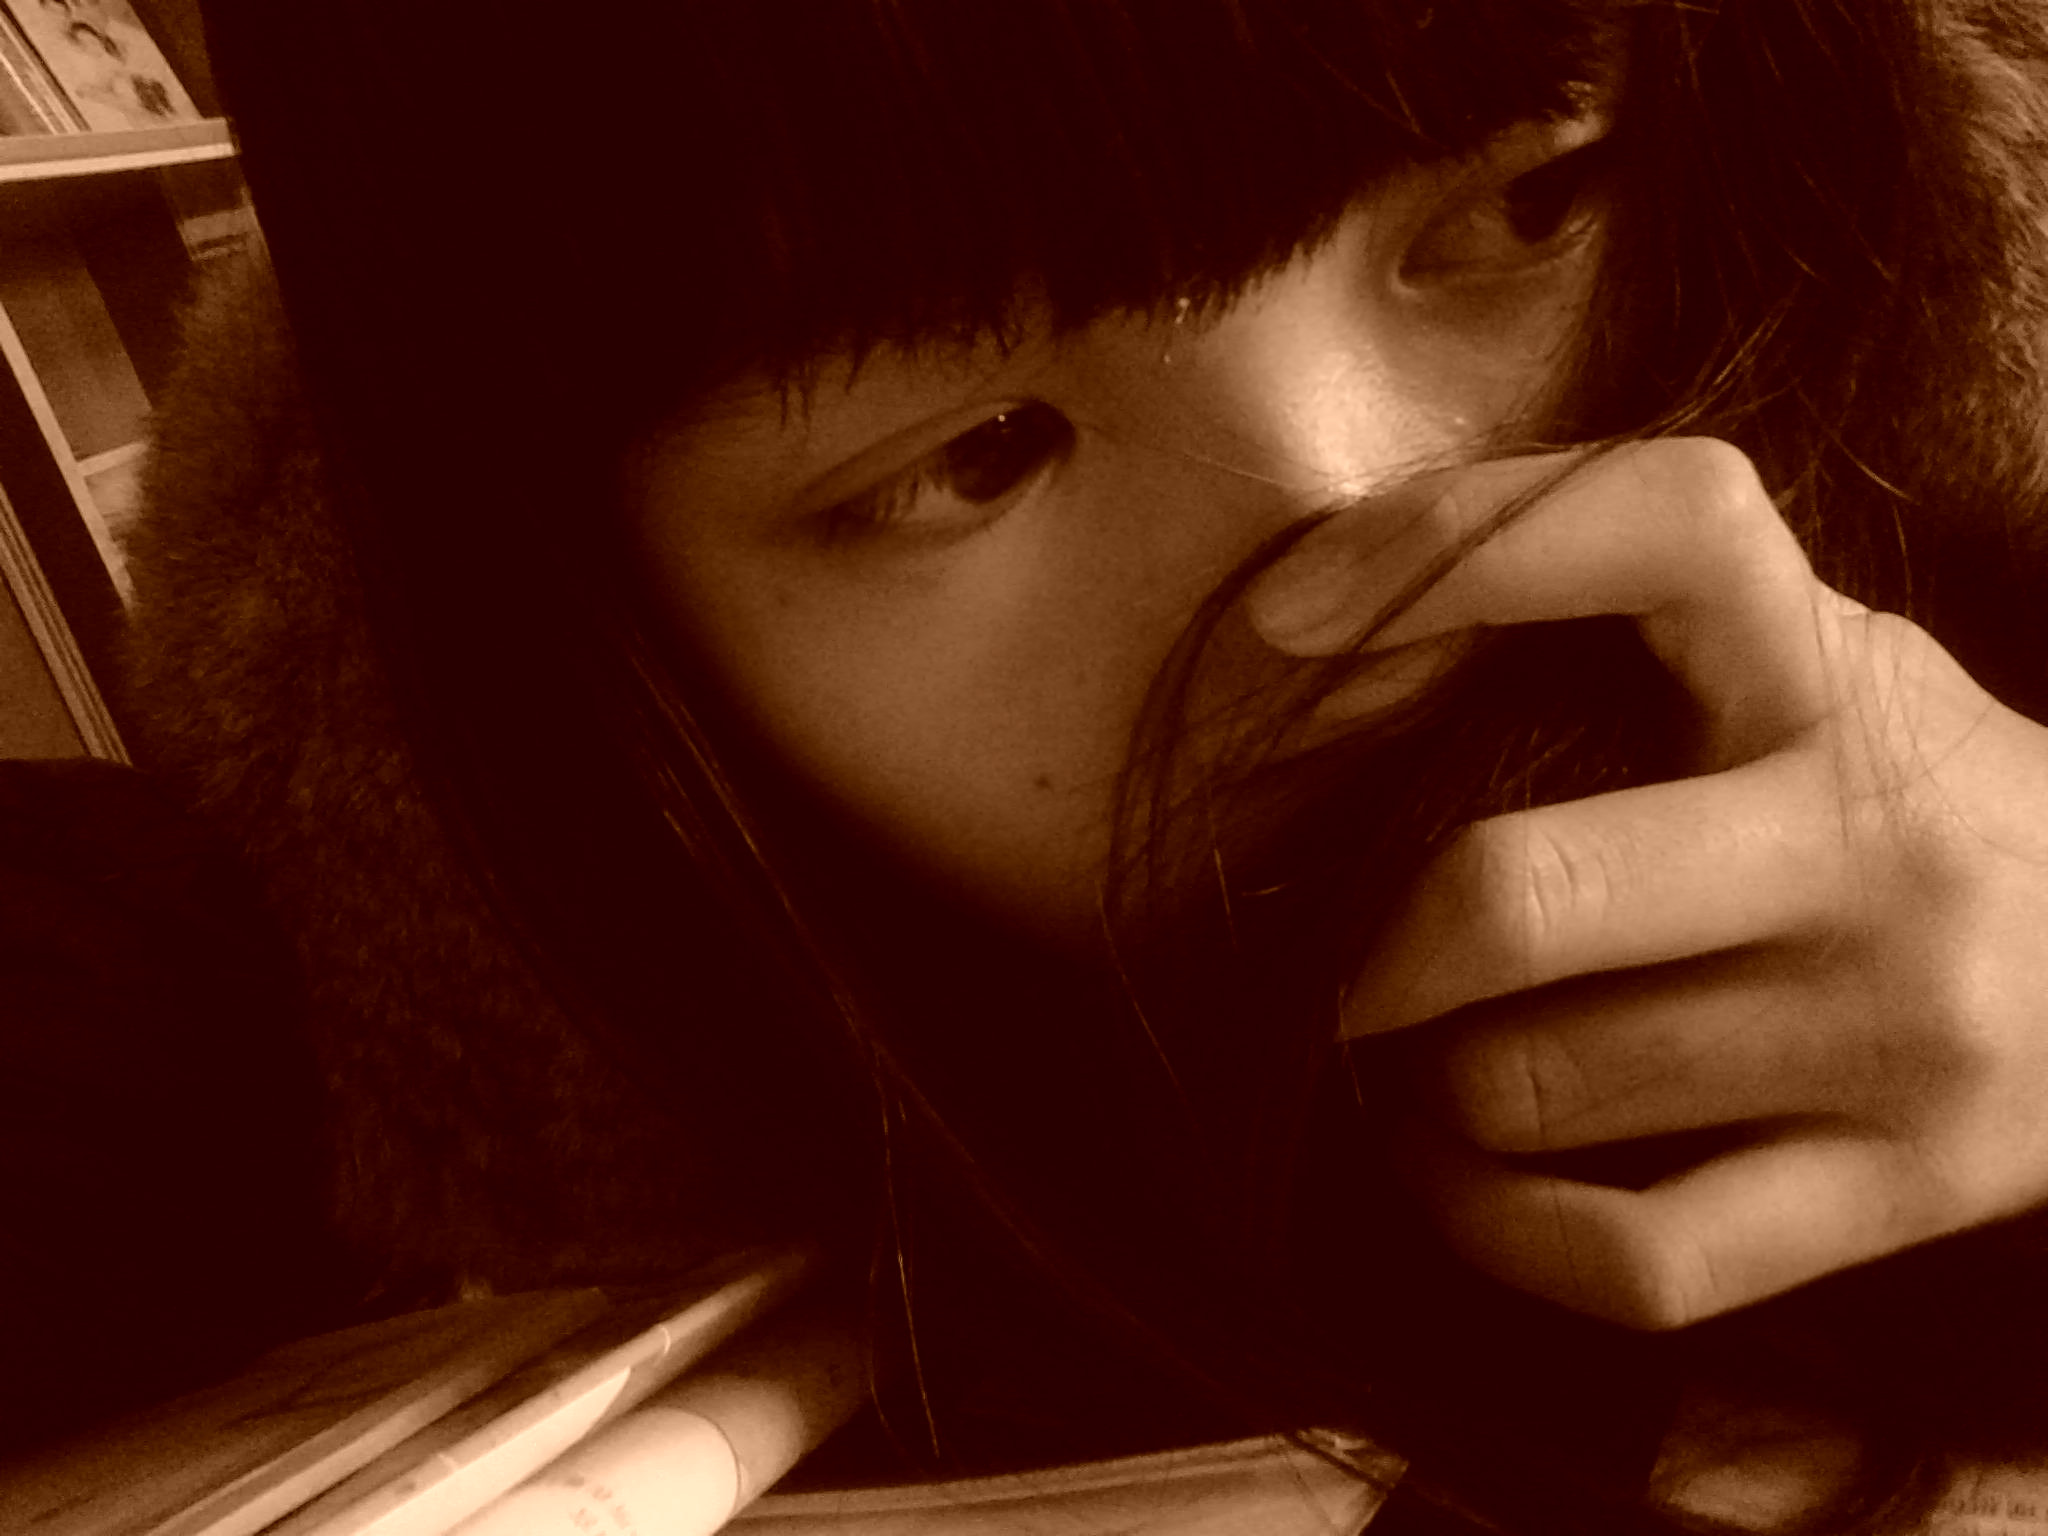 me】大眼睛大鼻子大嘴巴・・・・・